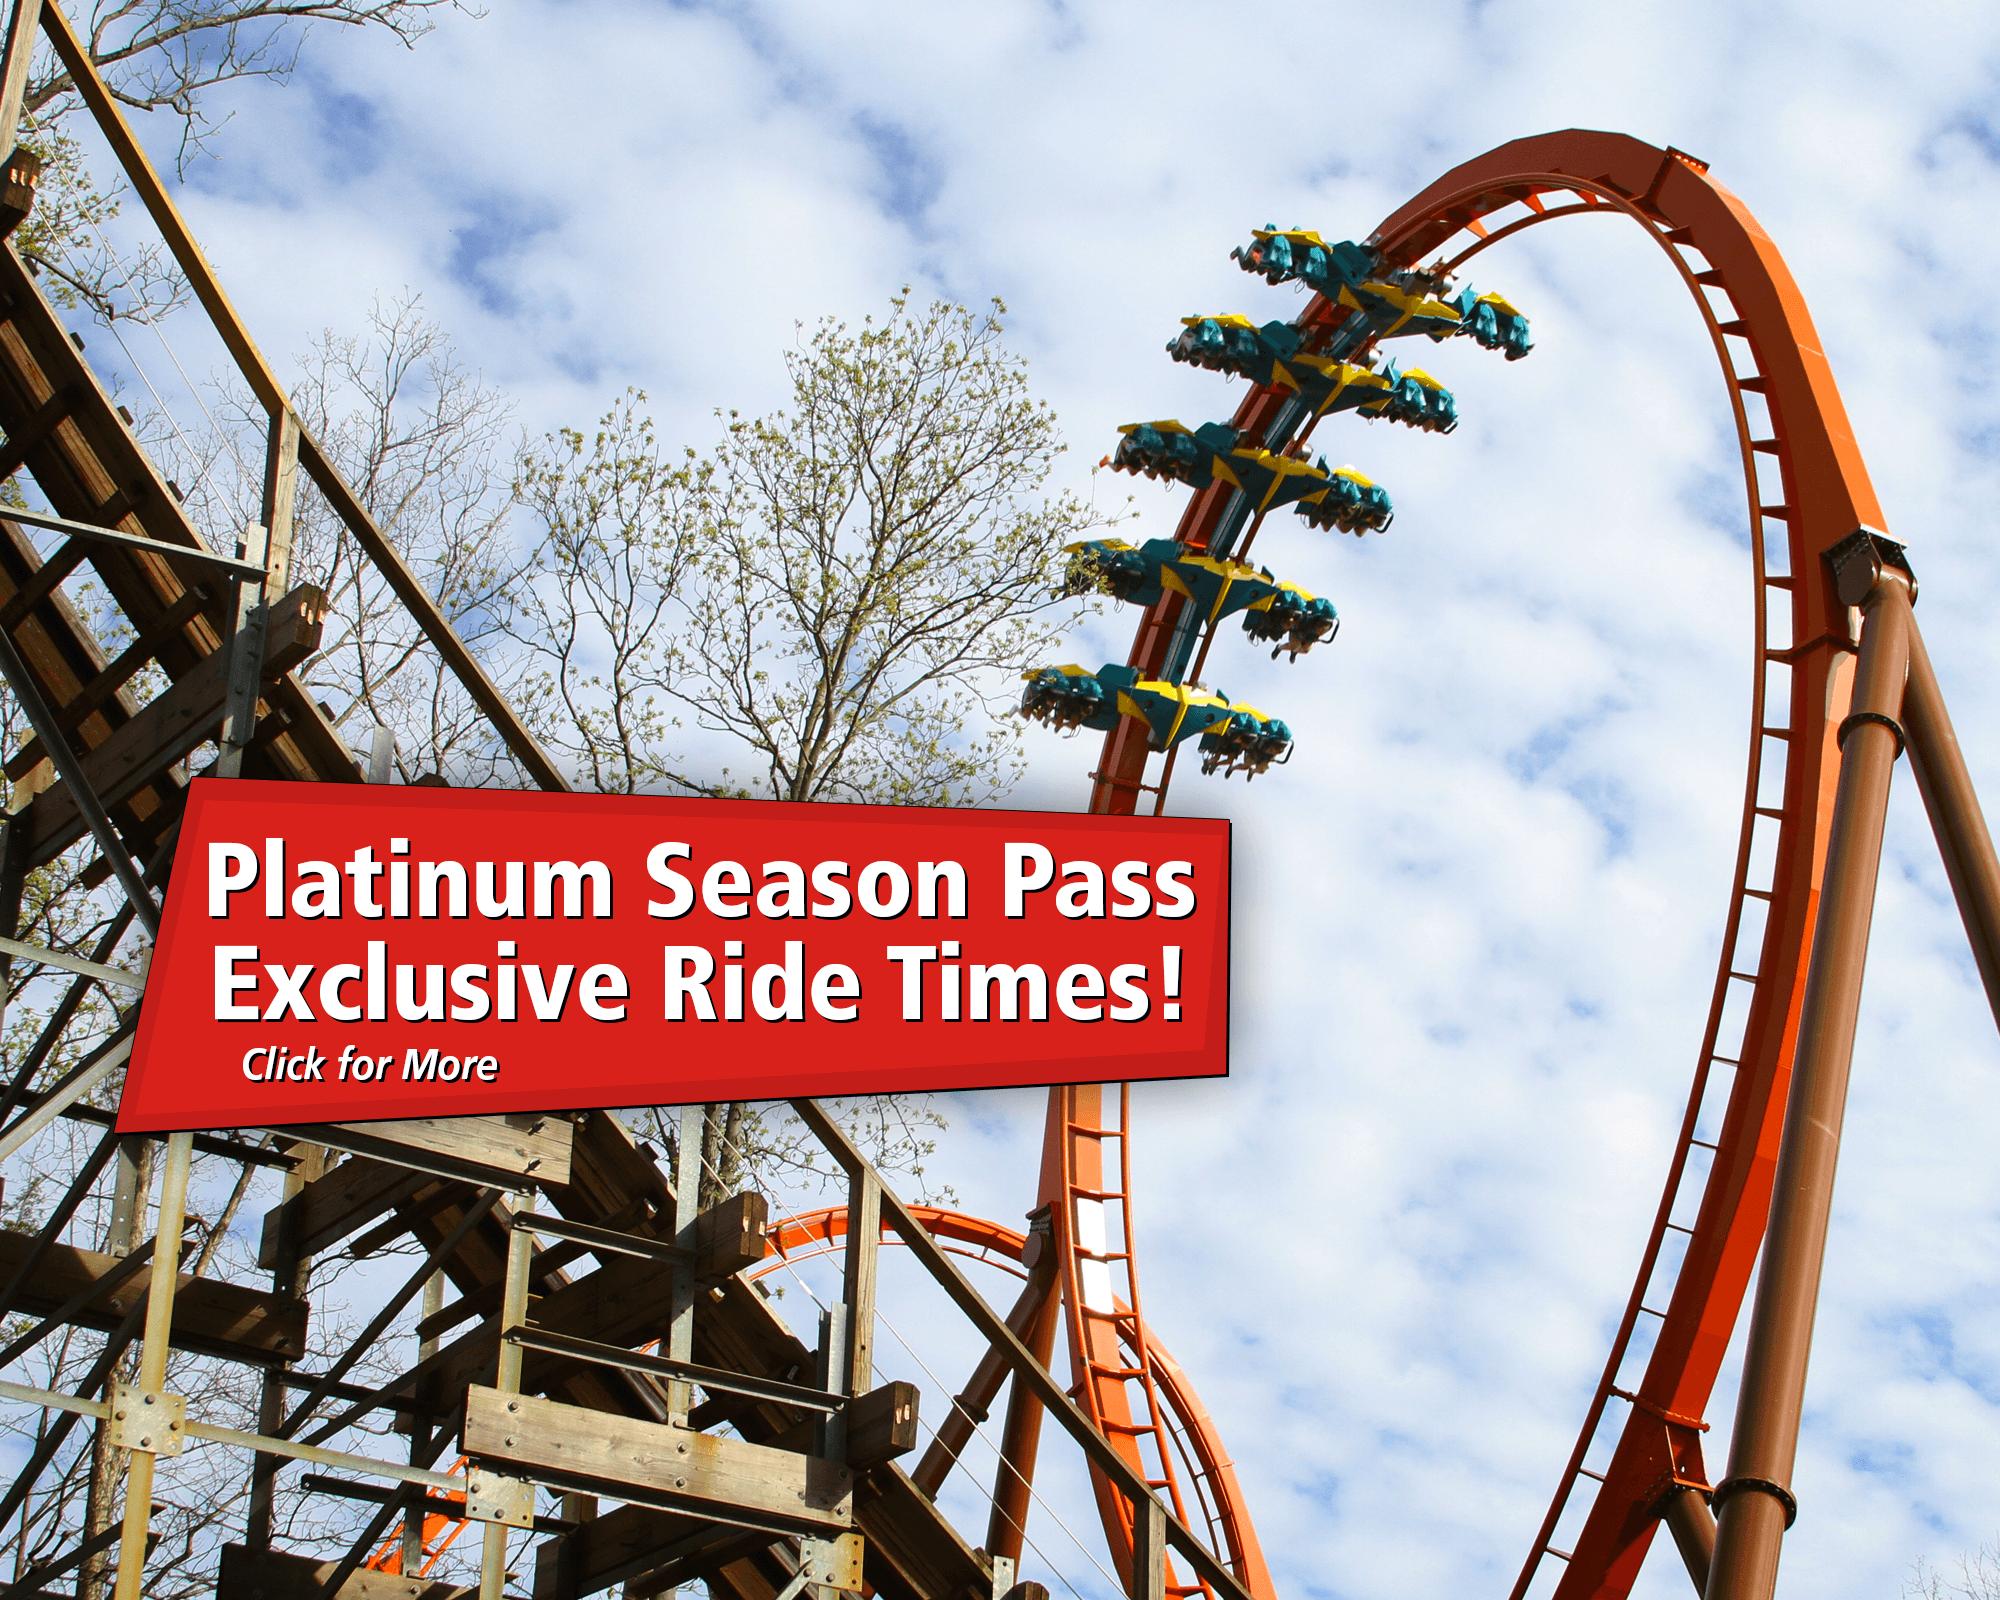 Platinum Season Pass | Holiday World & Splashin' Safari